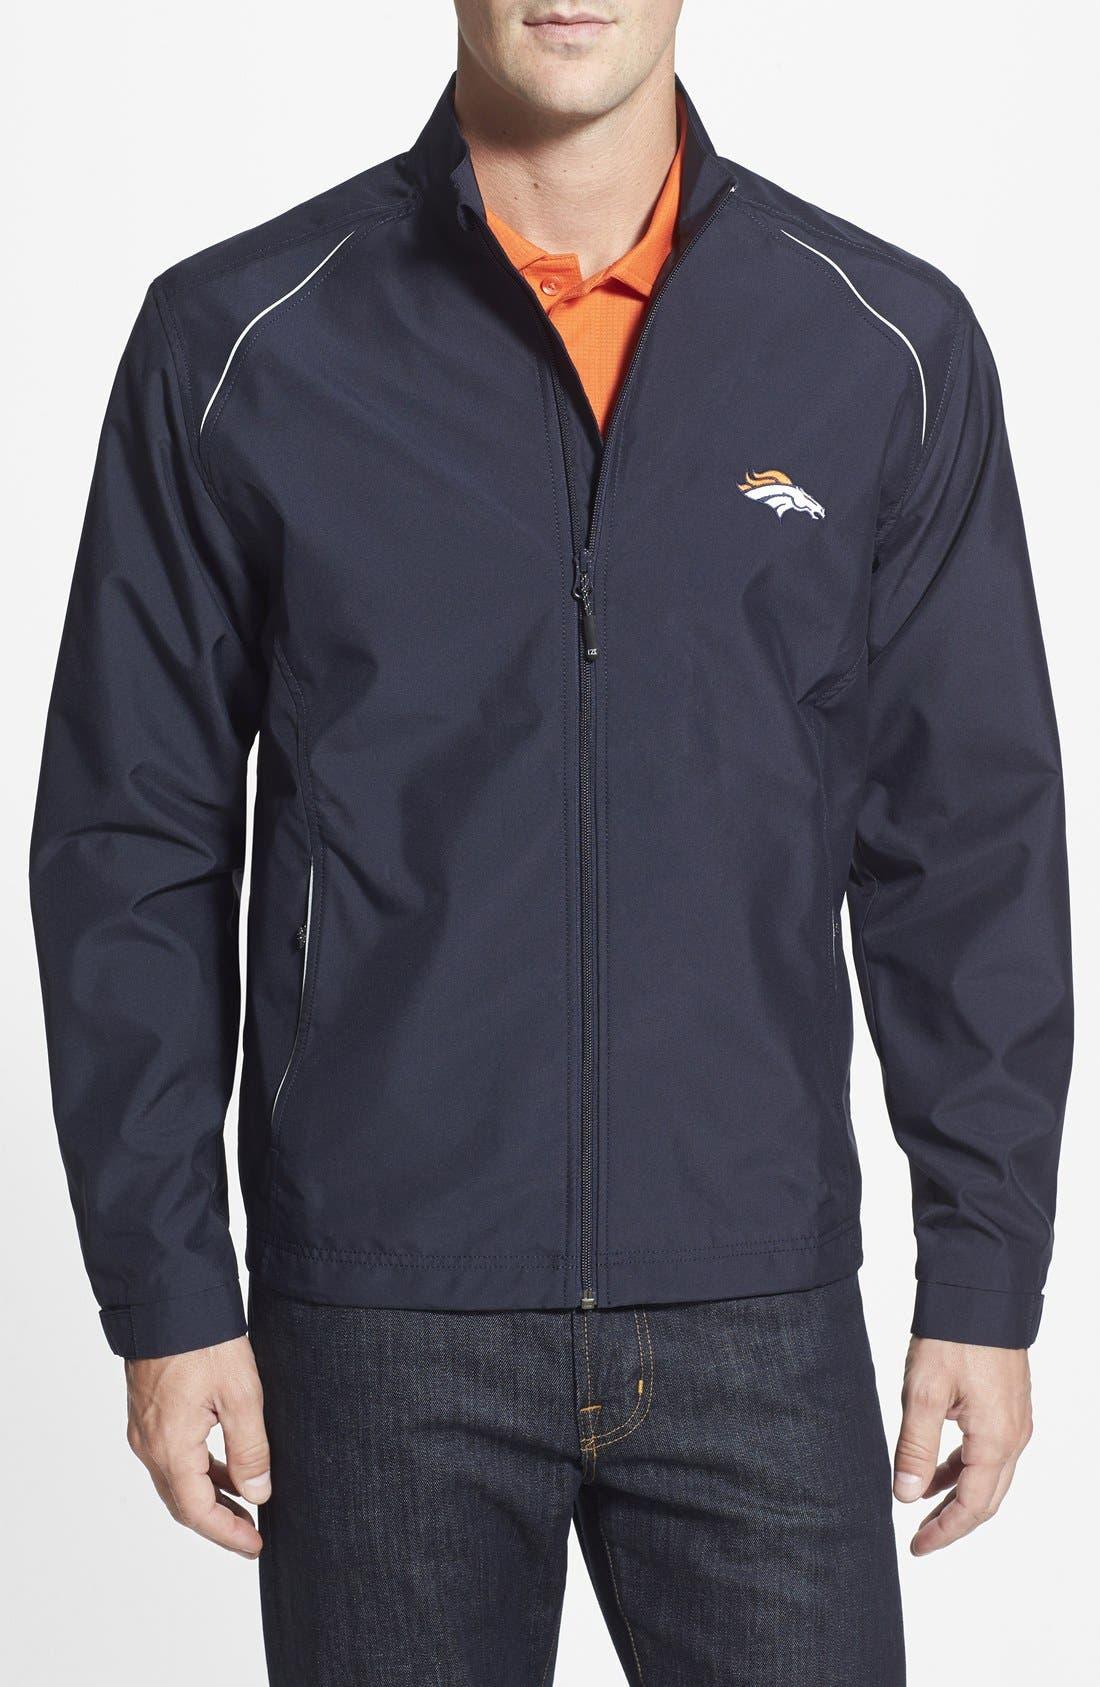 Denver Broncos - Beacon WeatherTec Wind & Water Resistant Jacket,                         Main,                         color, Navy Blue